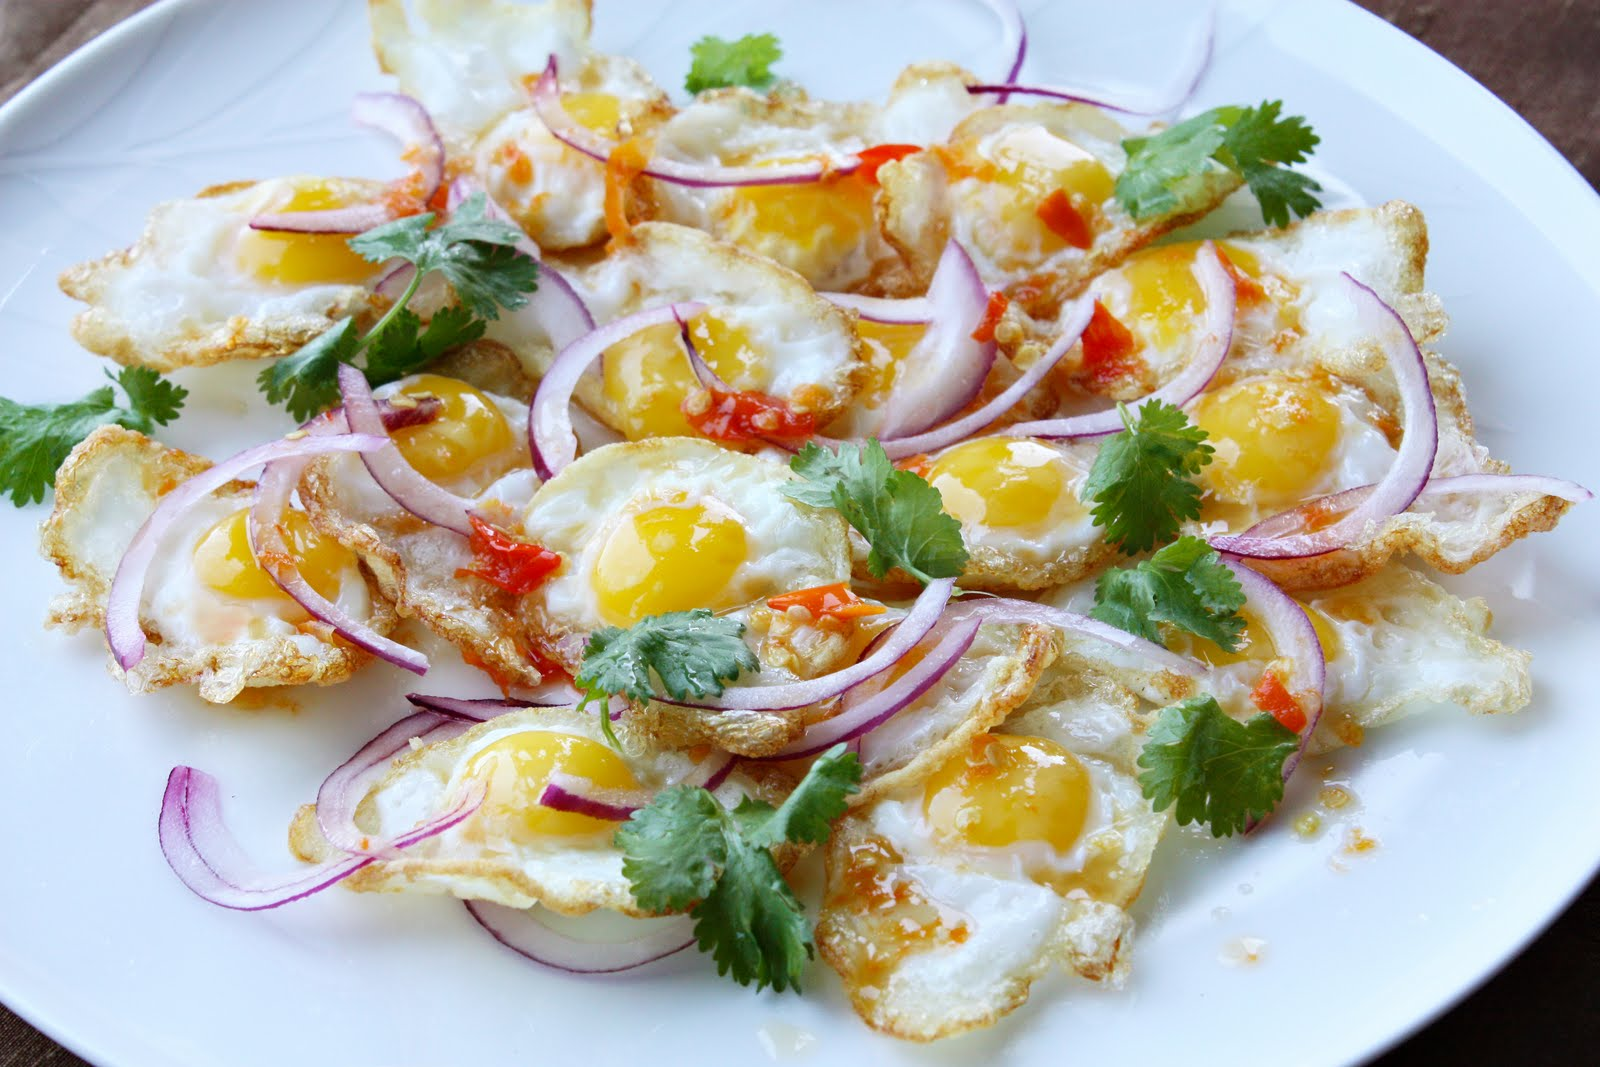 Tasty thai food recipes easy egg salad spicy fried egg salad easy egg salad spicy fried egg salad forumfinder Images